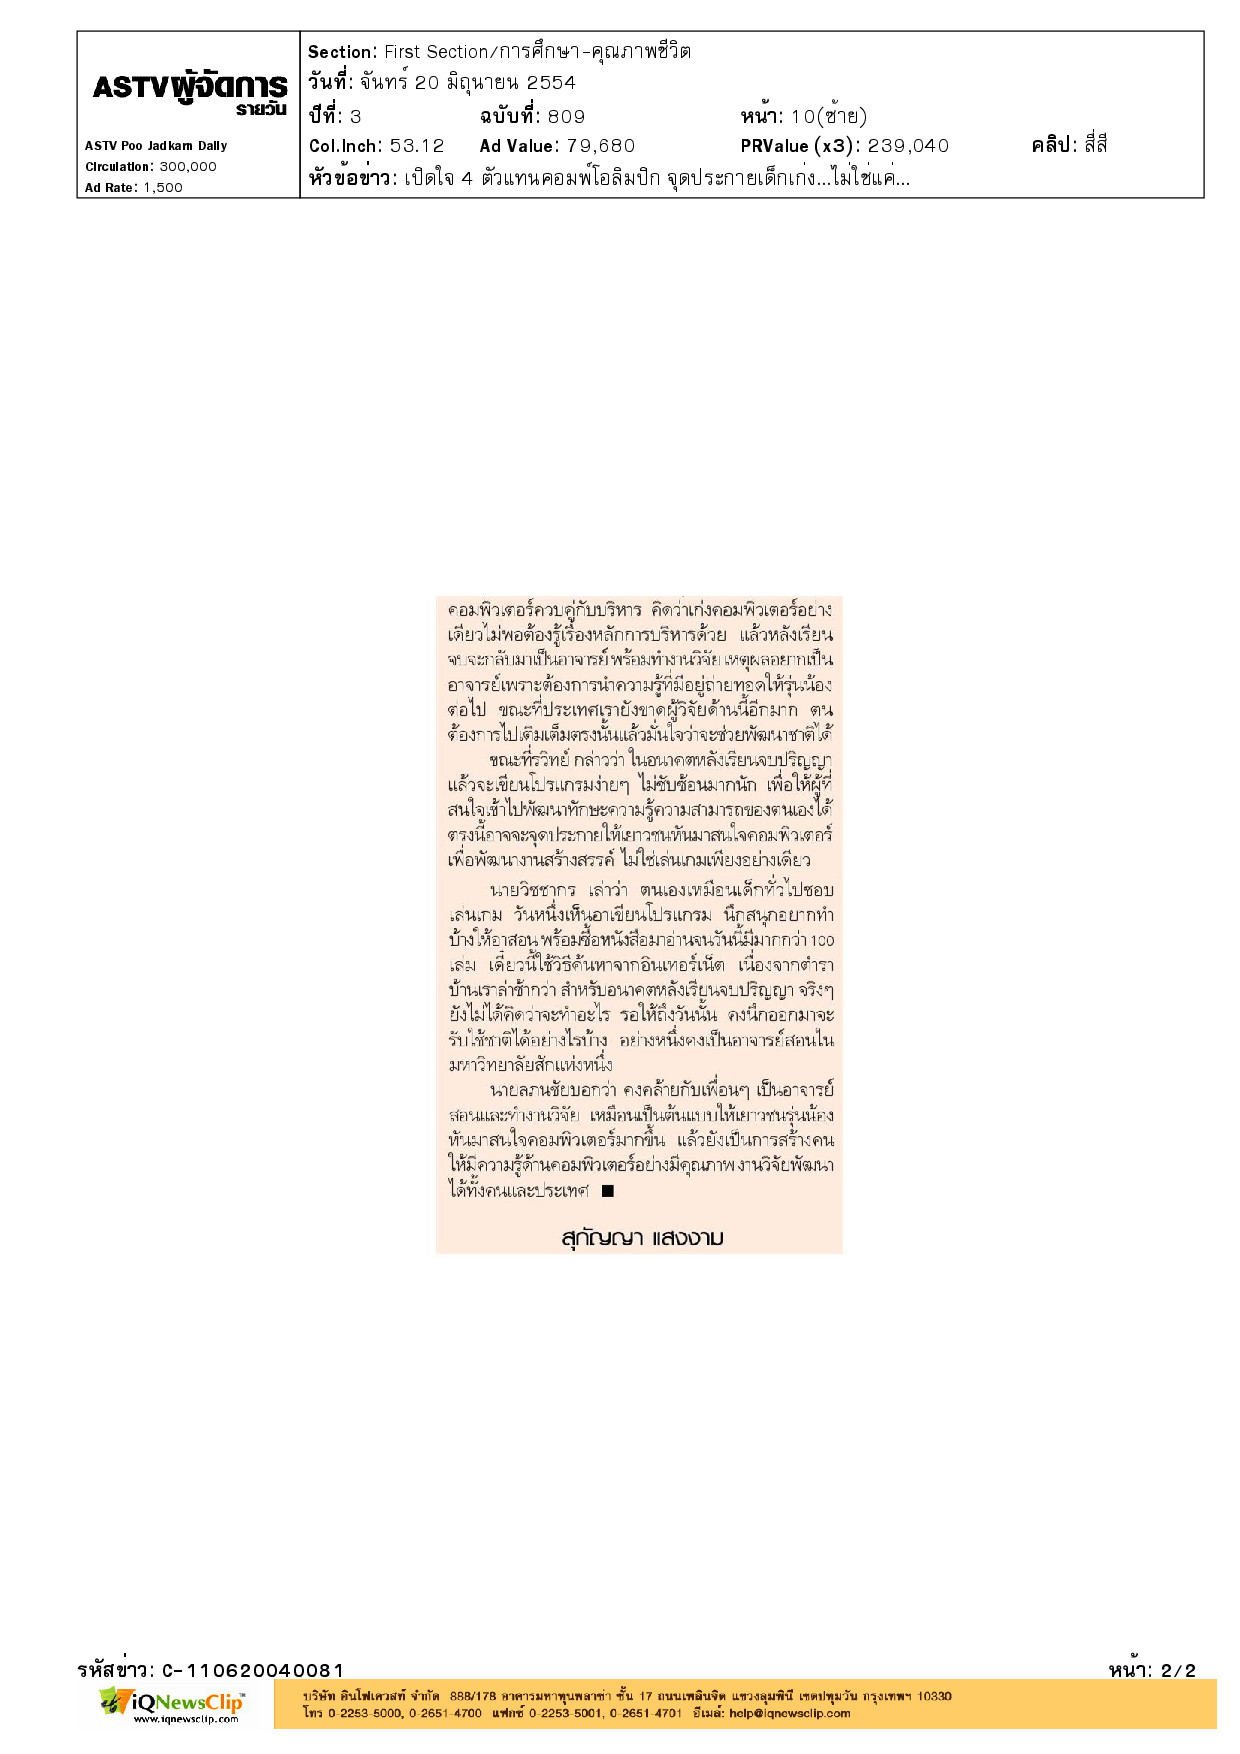 C-110620040081.pdf-1